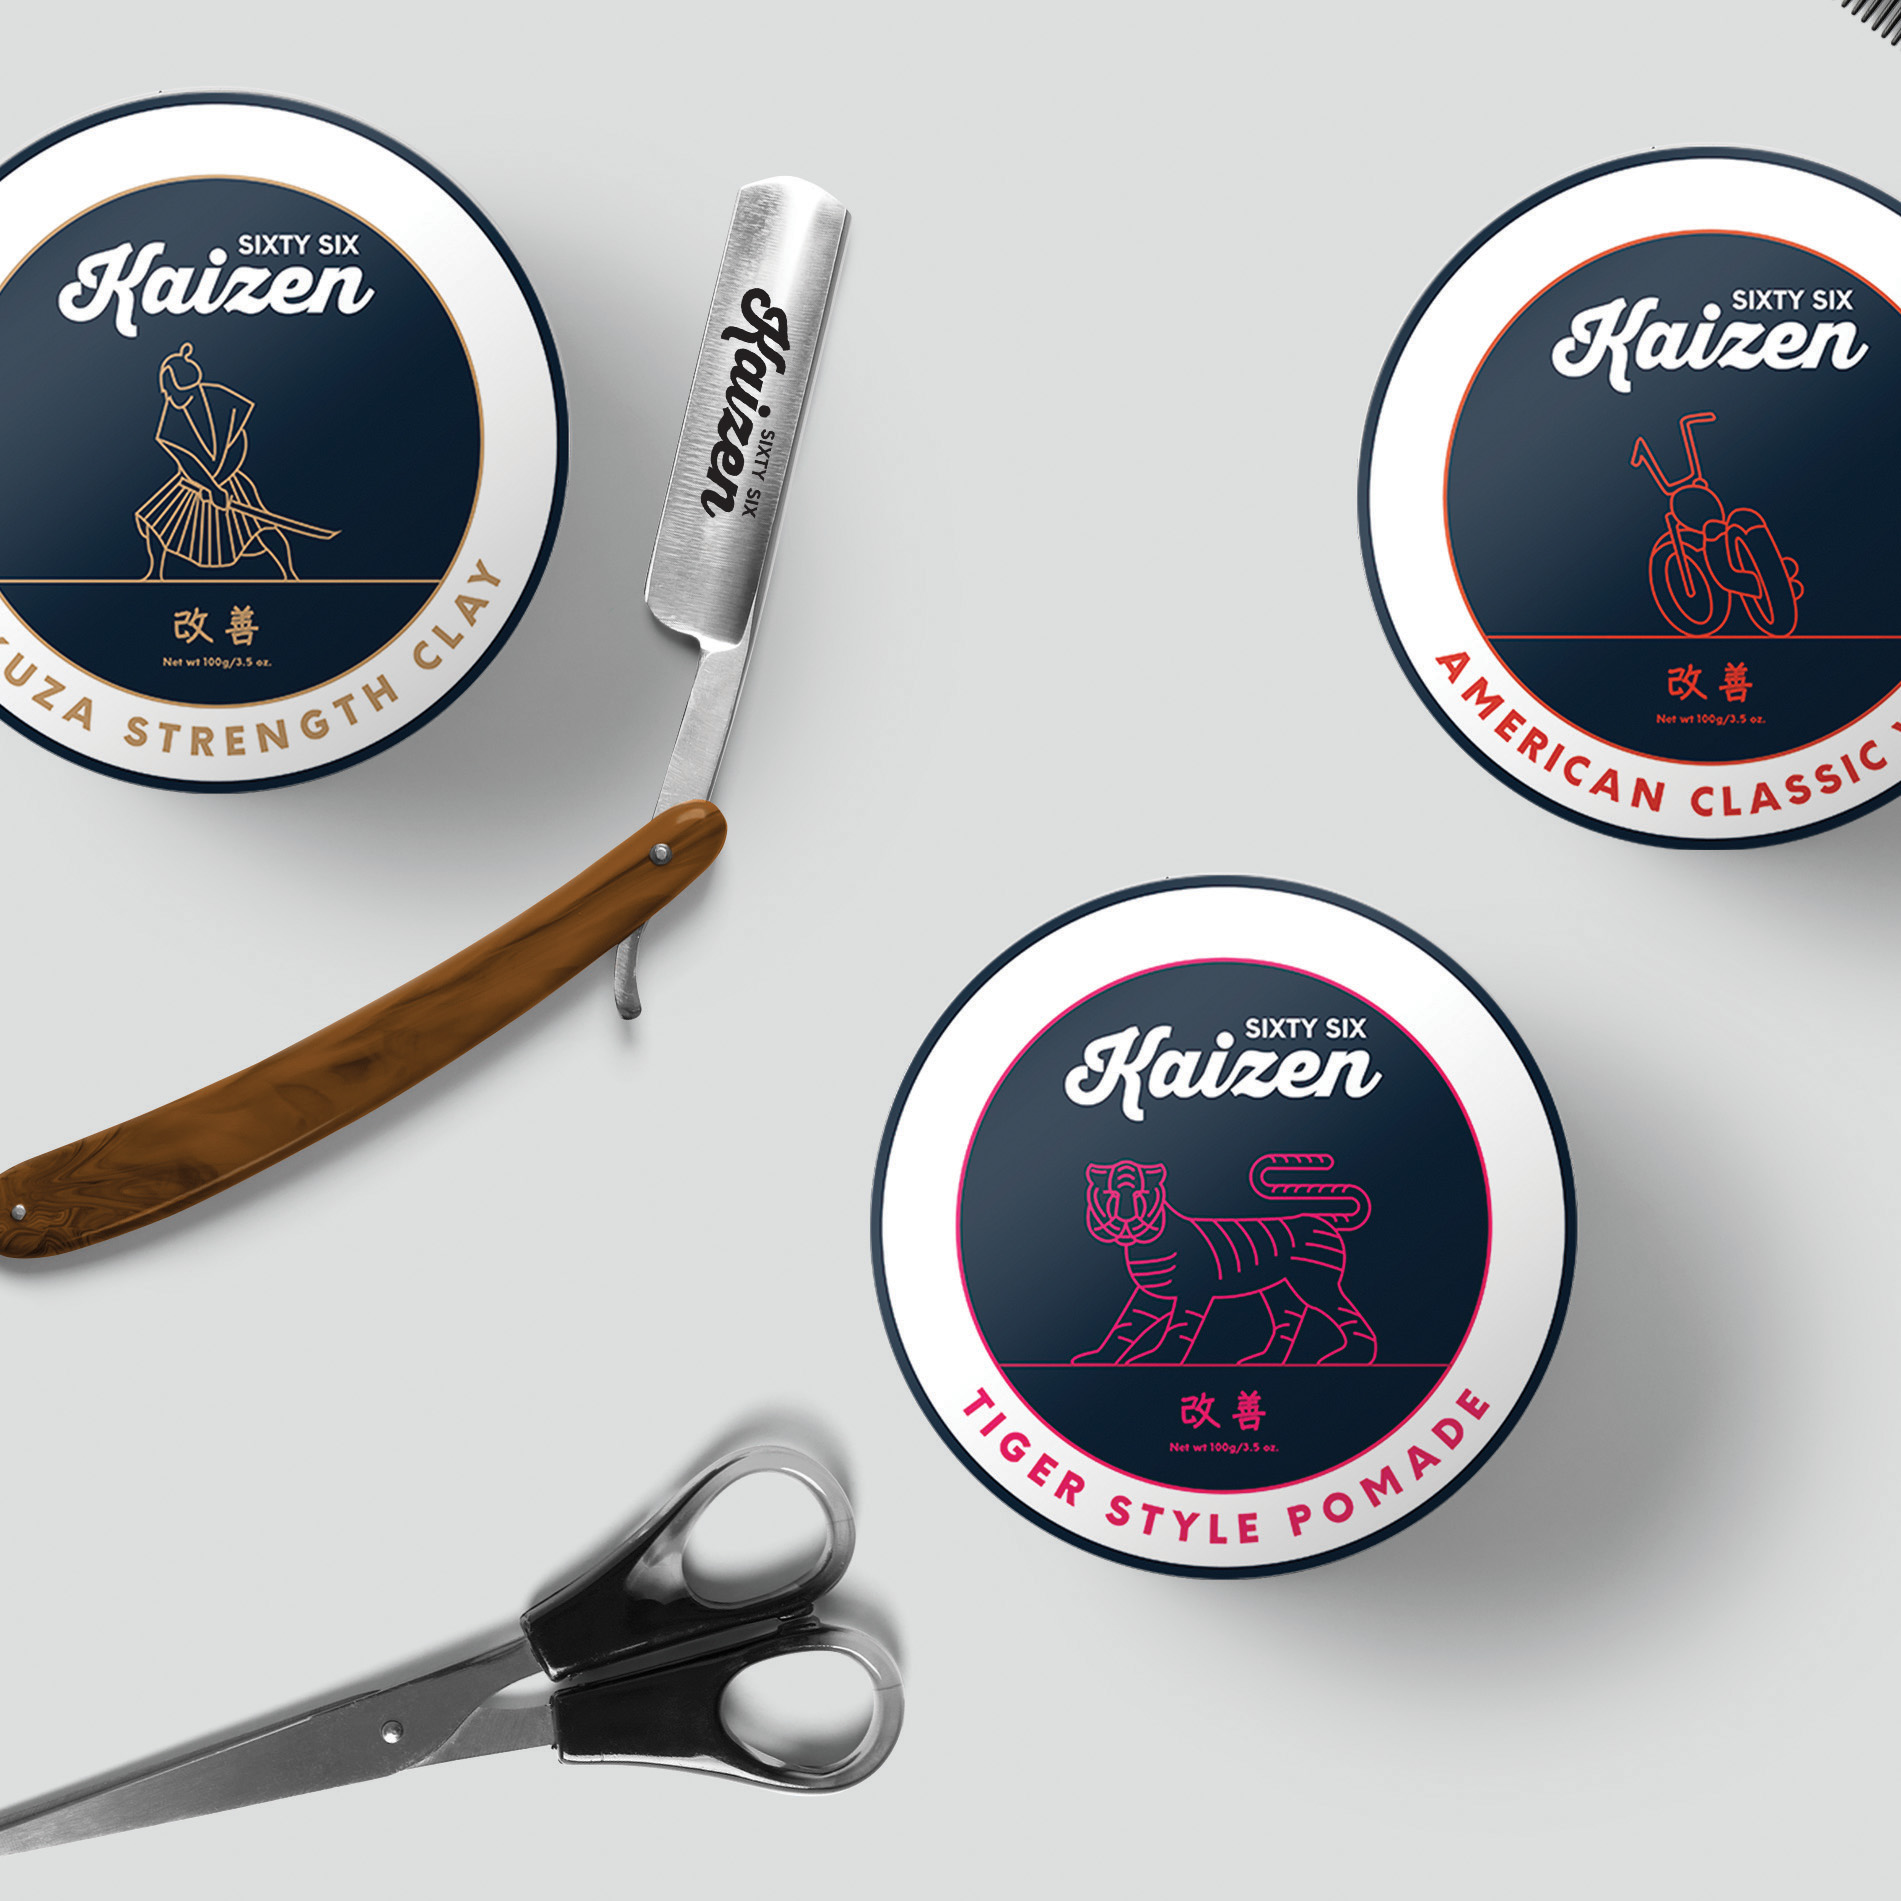 SIXTY SIX KAIZEN  Branding